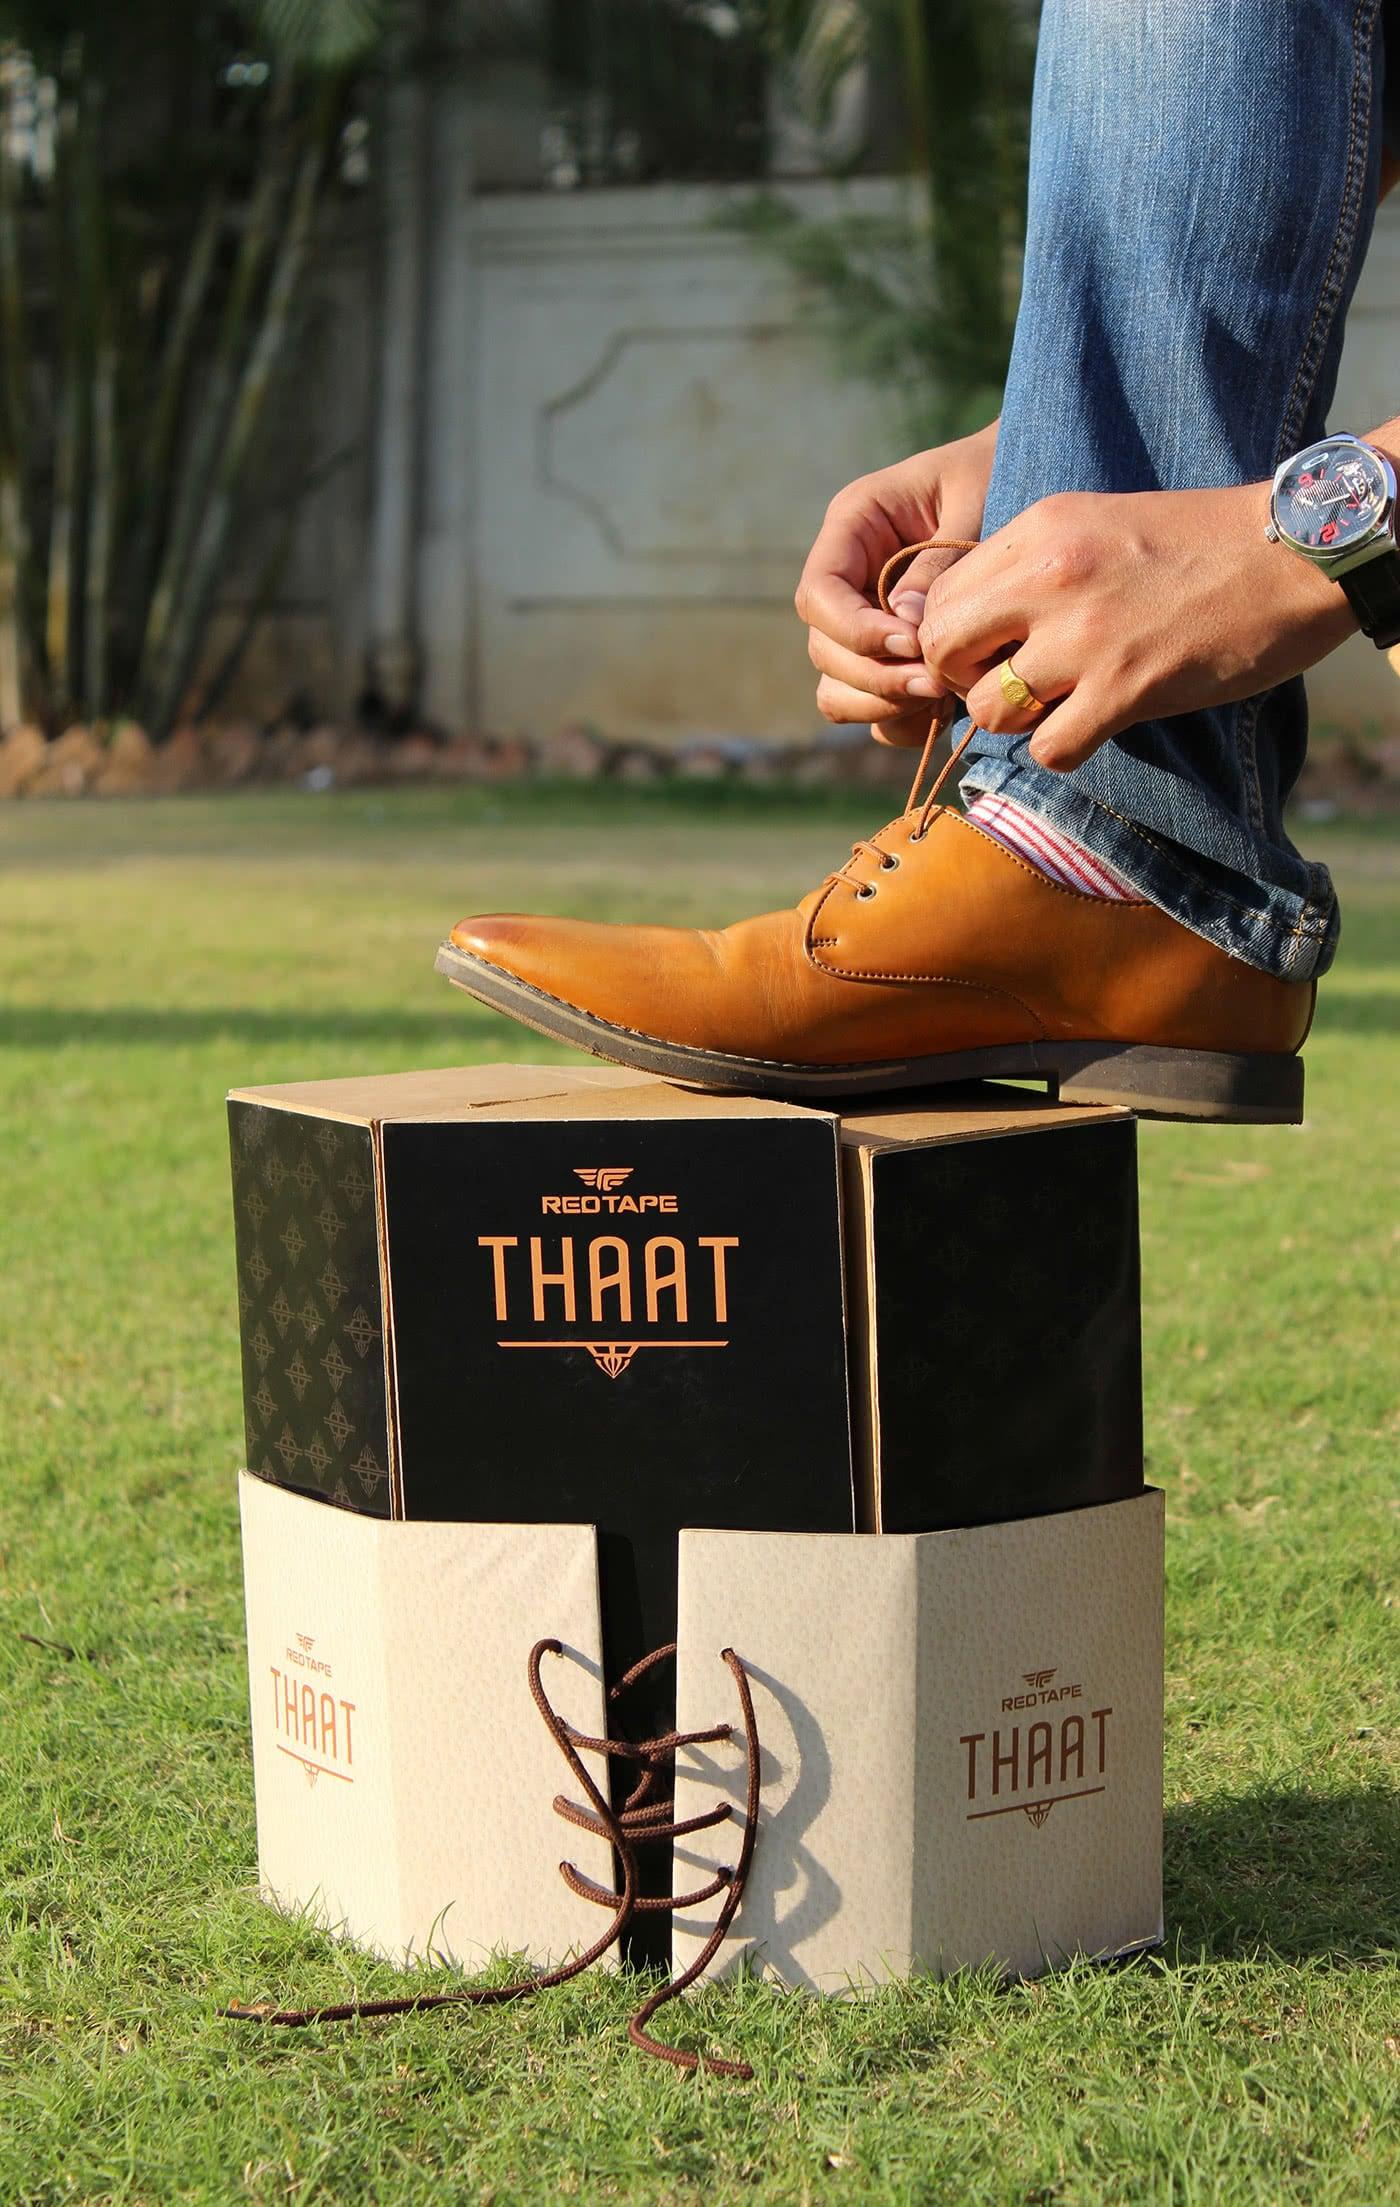 scatola calzature redtape